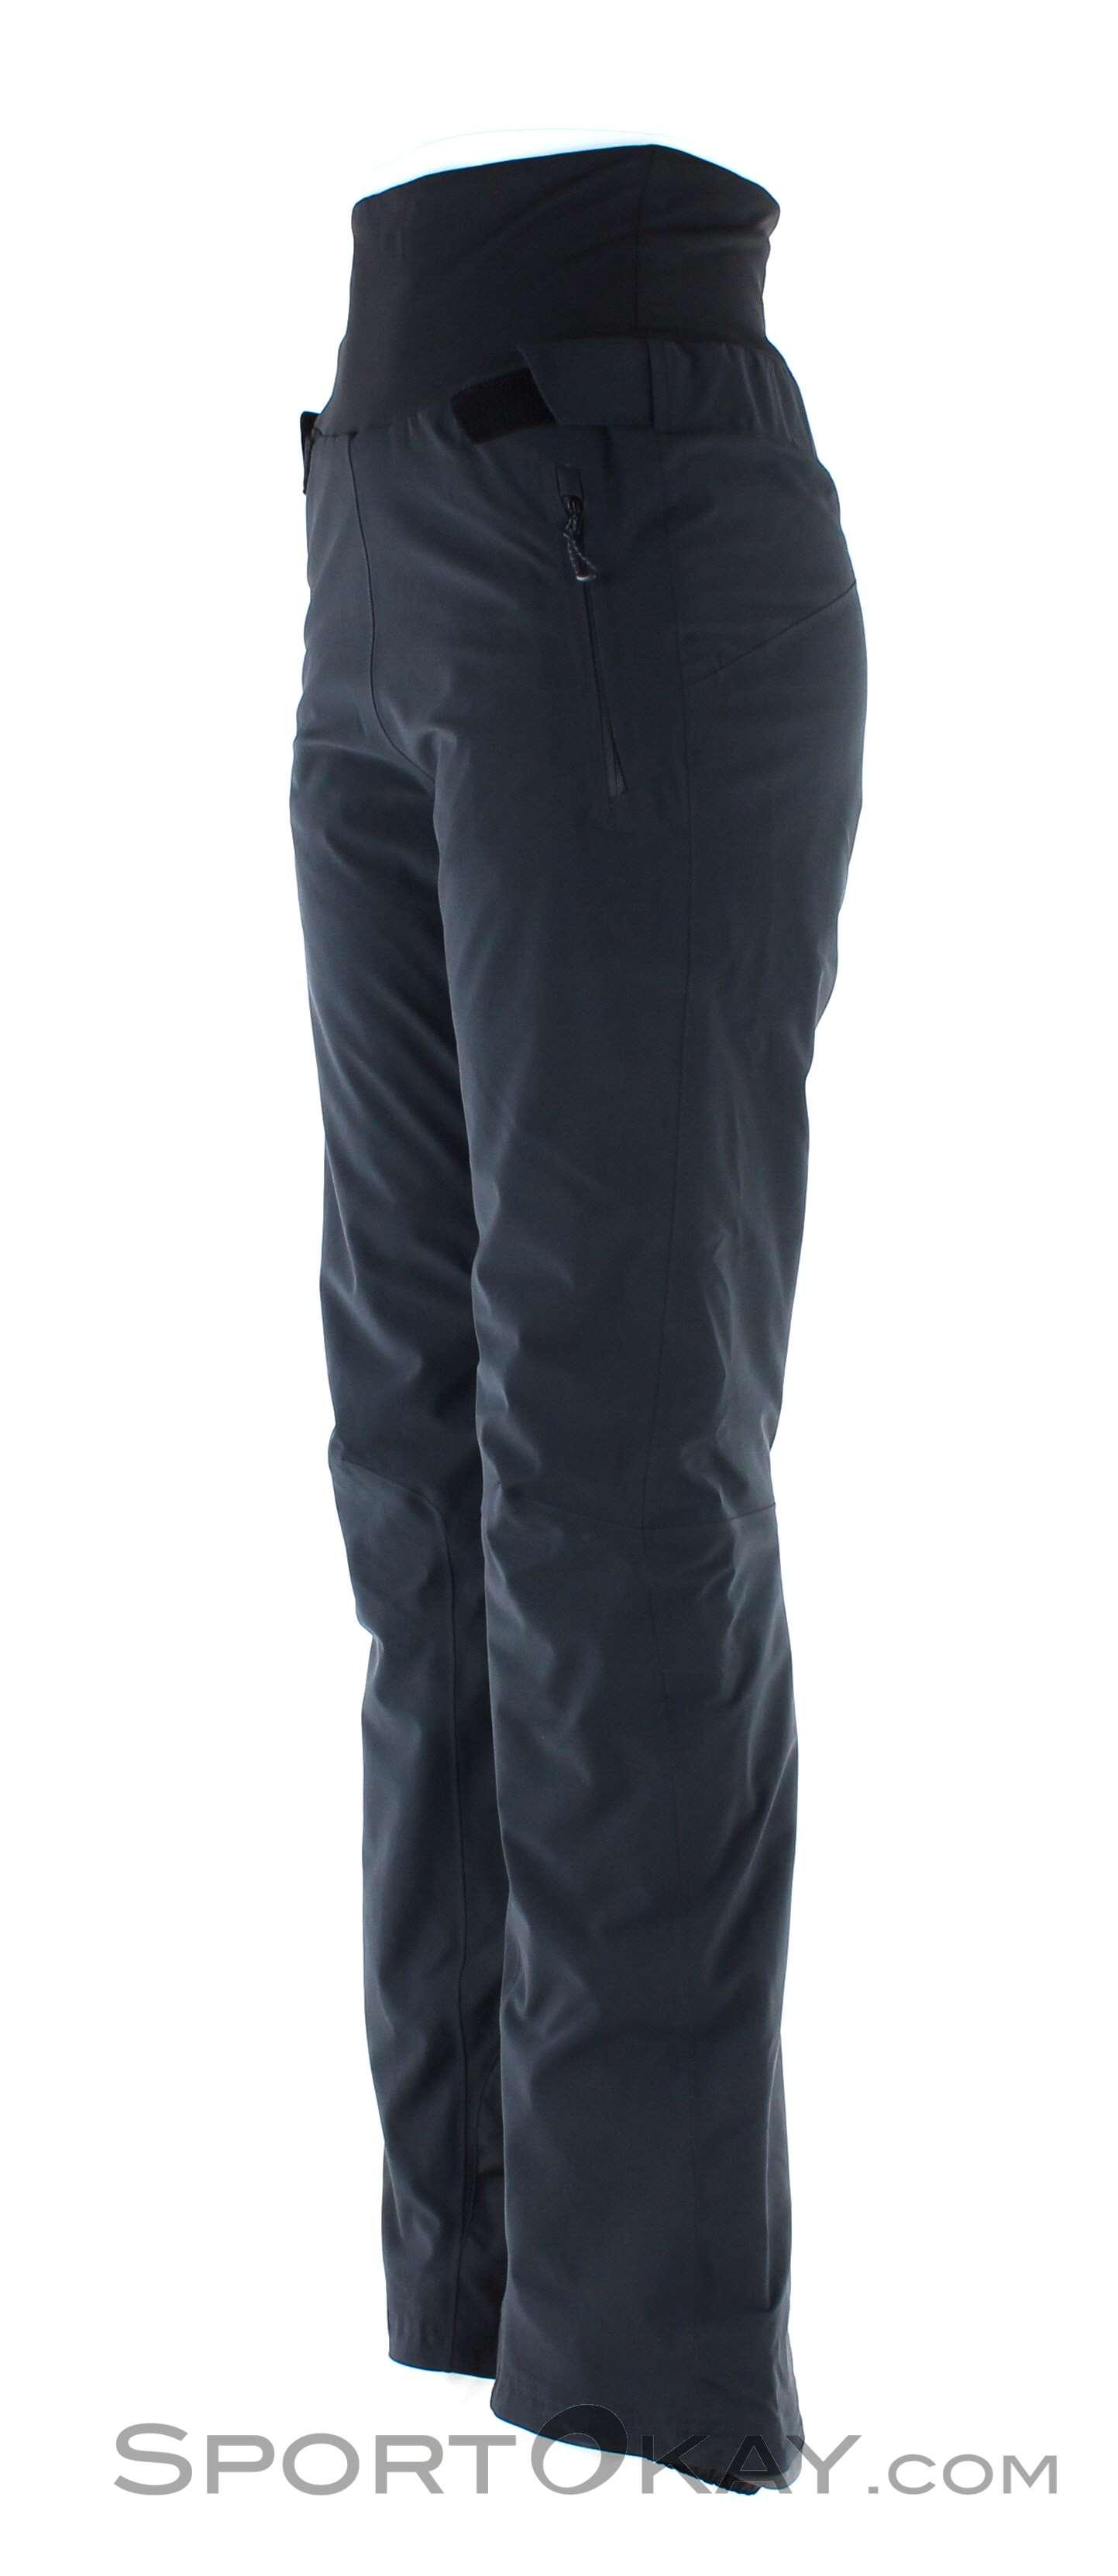 Salomon Icefancy Pant Womens Ski Pants Short Cut Ski Pants lvH5d